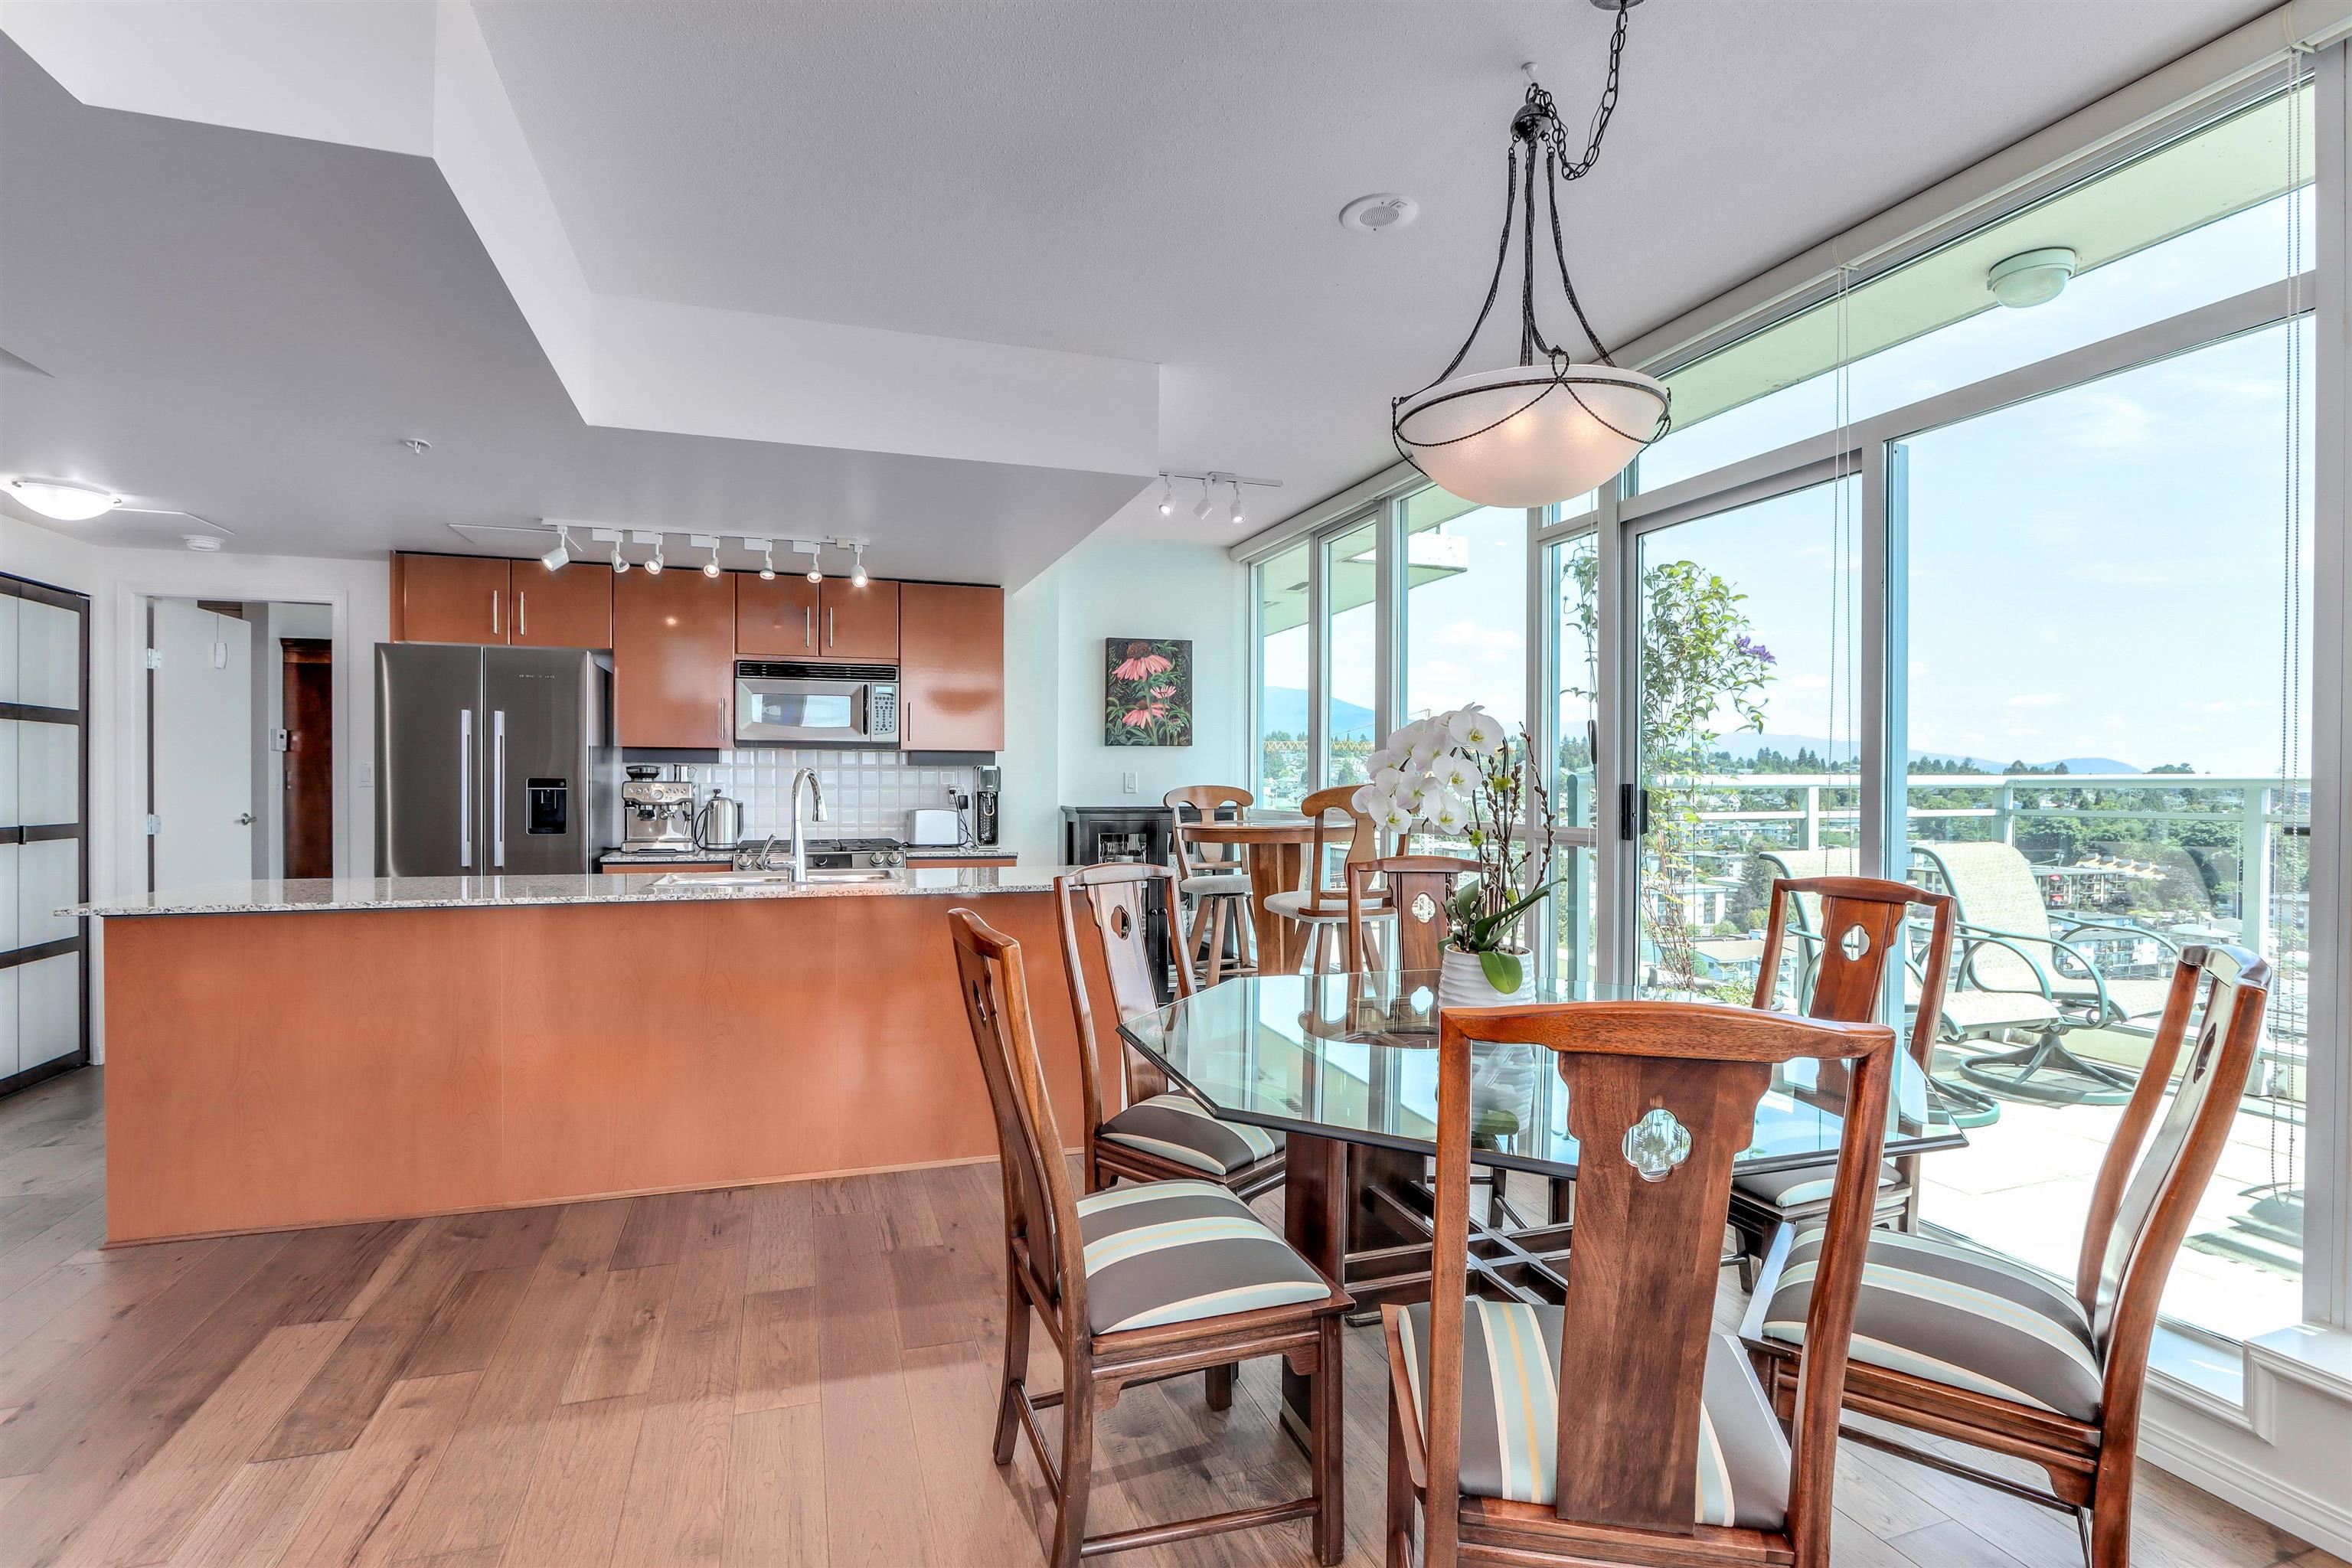 2202 188 E ESPLANADE - Lower Lonsdale Apartment/Condo for sale, 2 Bedrooms (R2618412) - #6